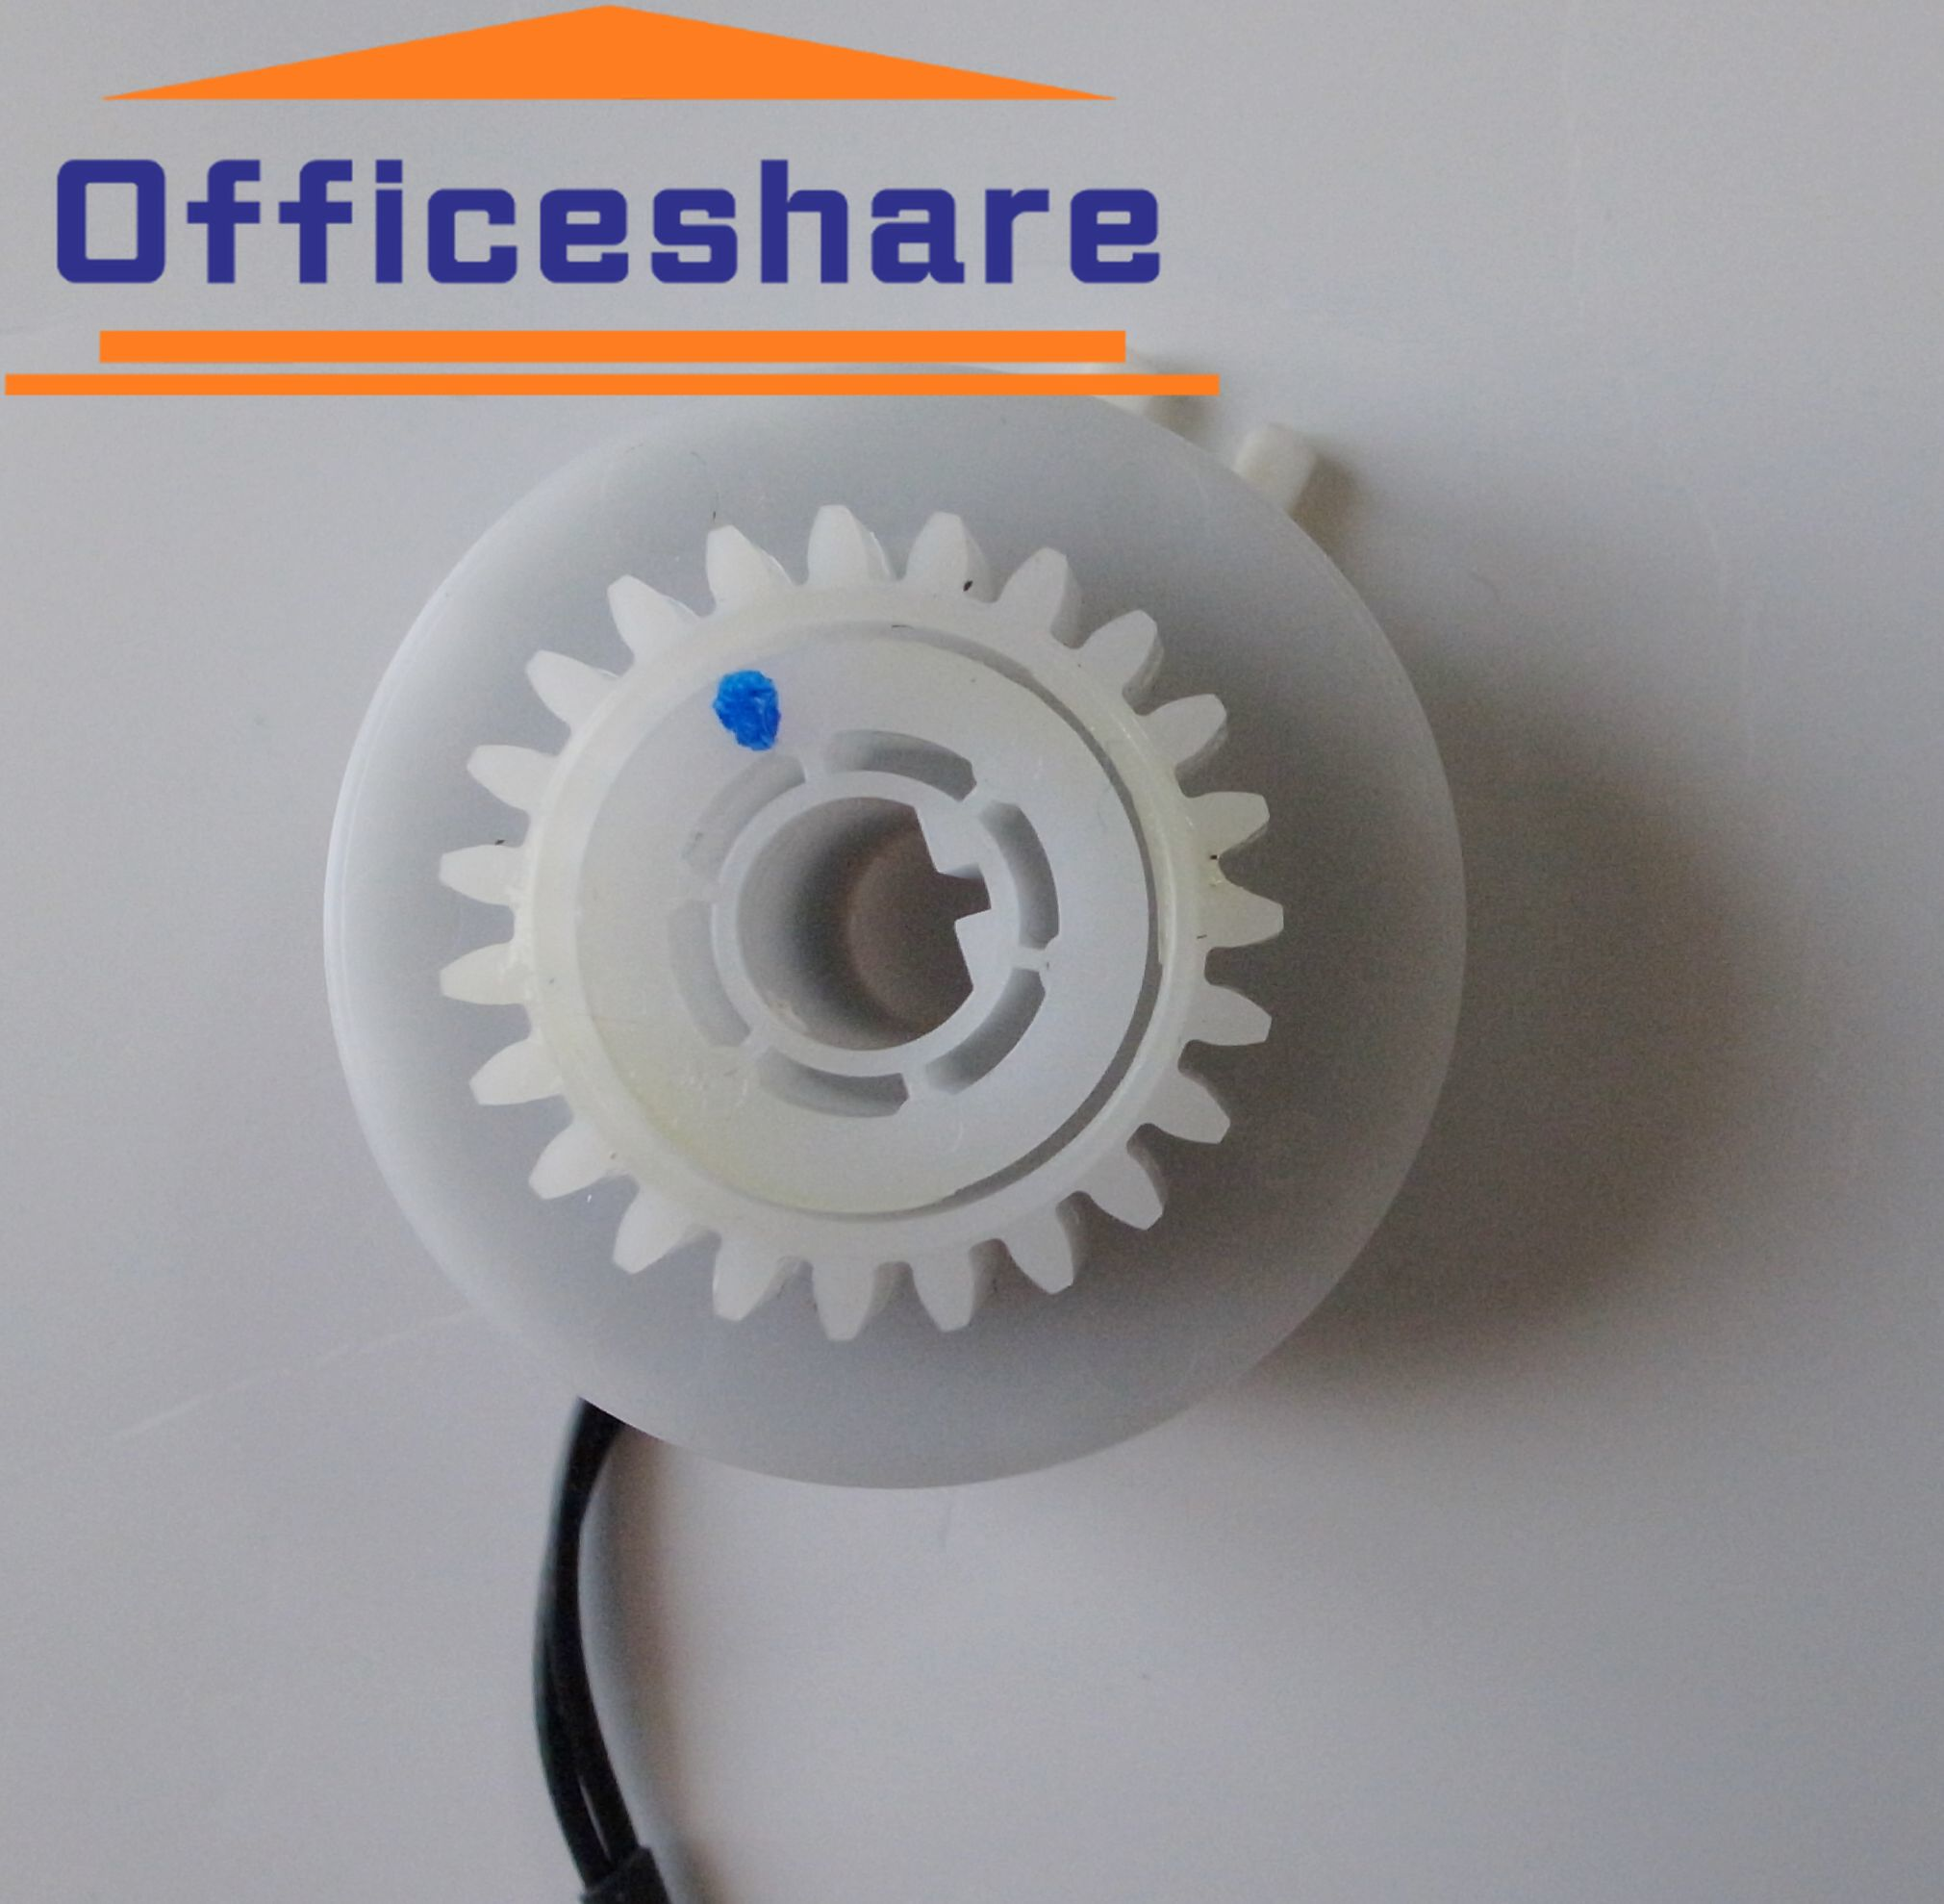 1pcs JC47-00033B Embreagem Elétrica para Samsung SCX3400 SCX3405 SCX3407 ML2160 ML2164 ML2165 ML2167 ML2168 ML1660 M2020 M2070 SF760